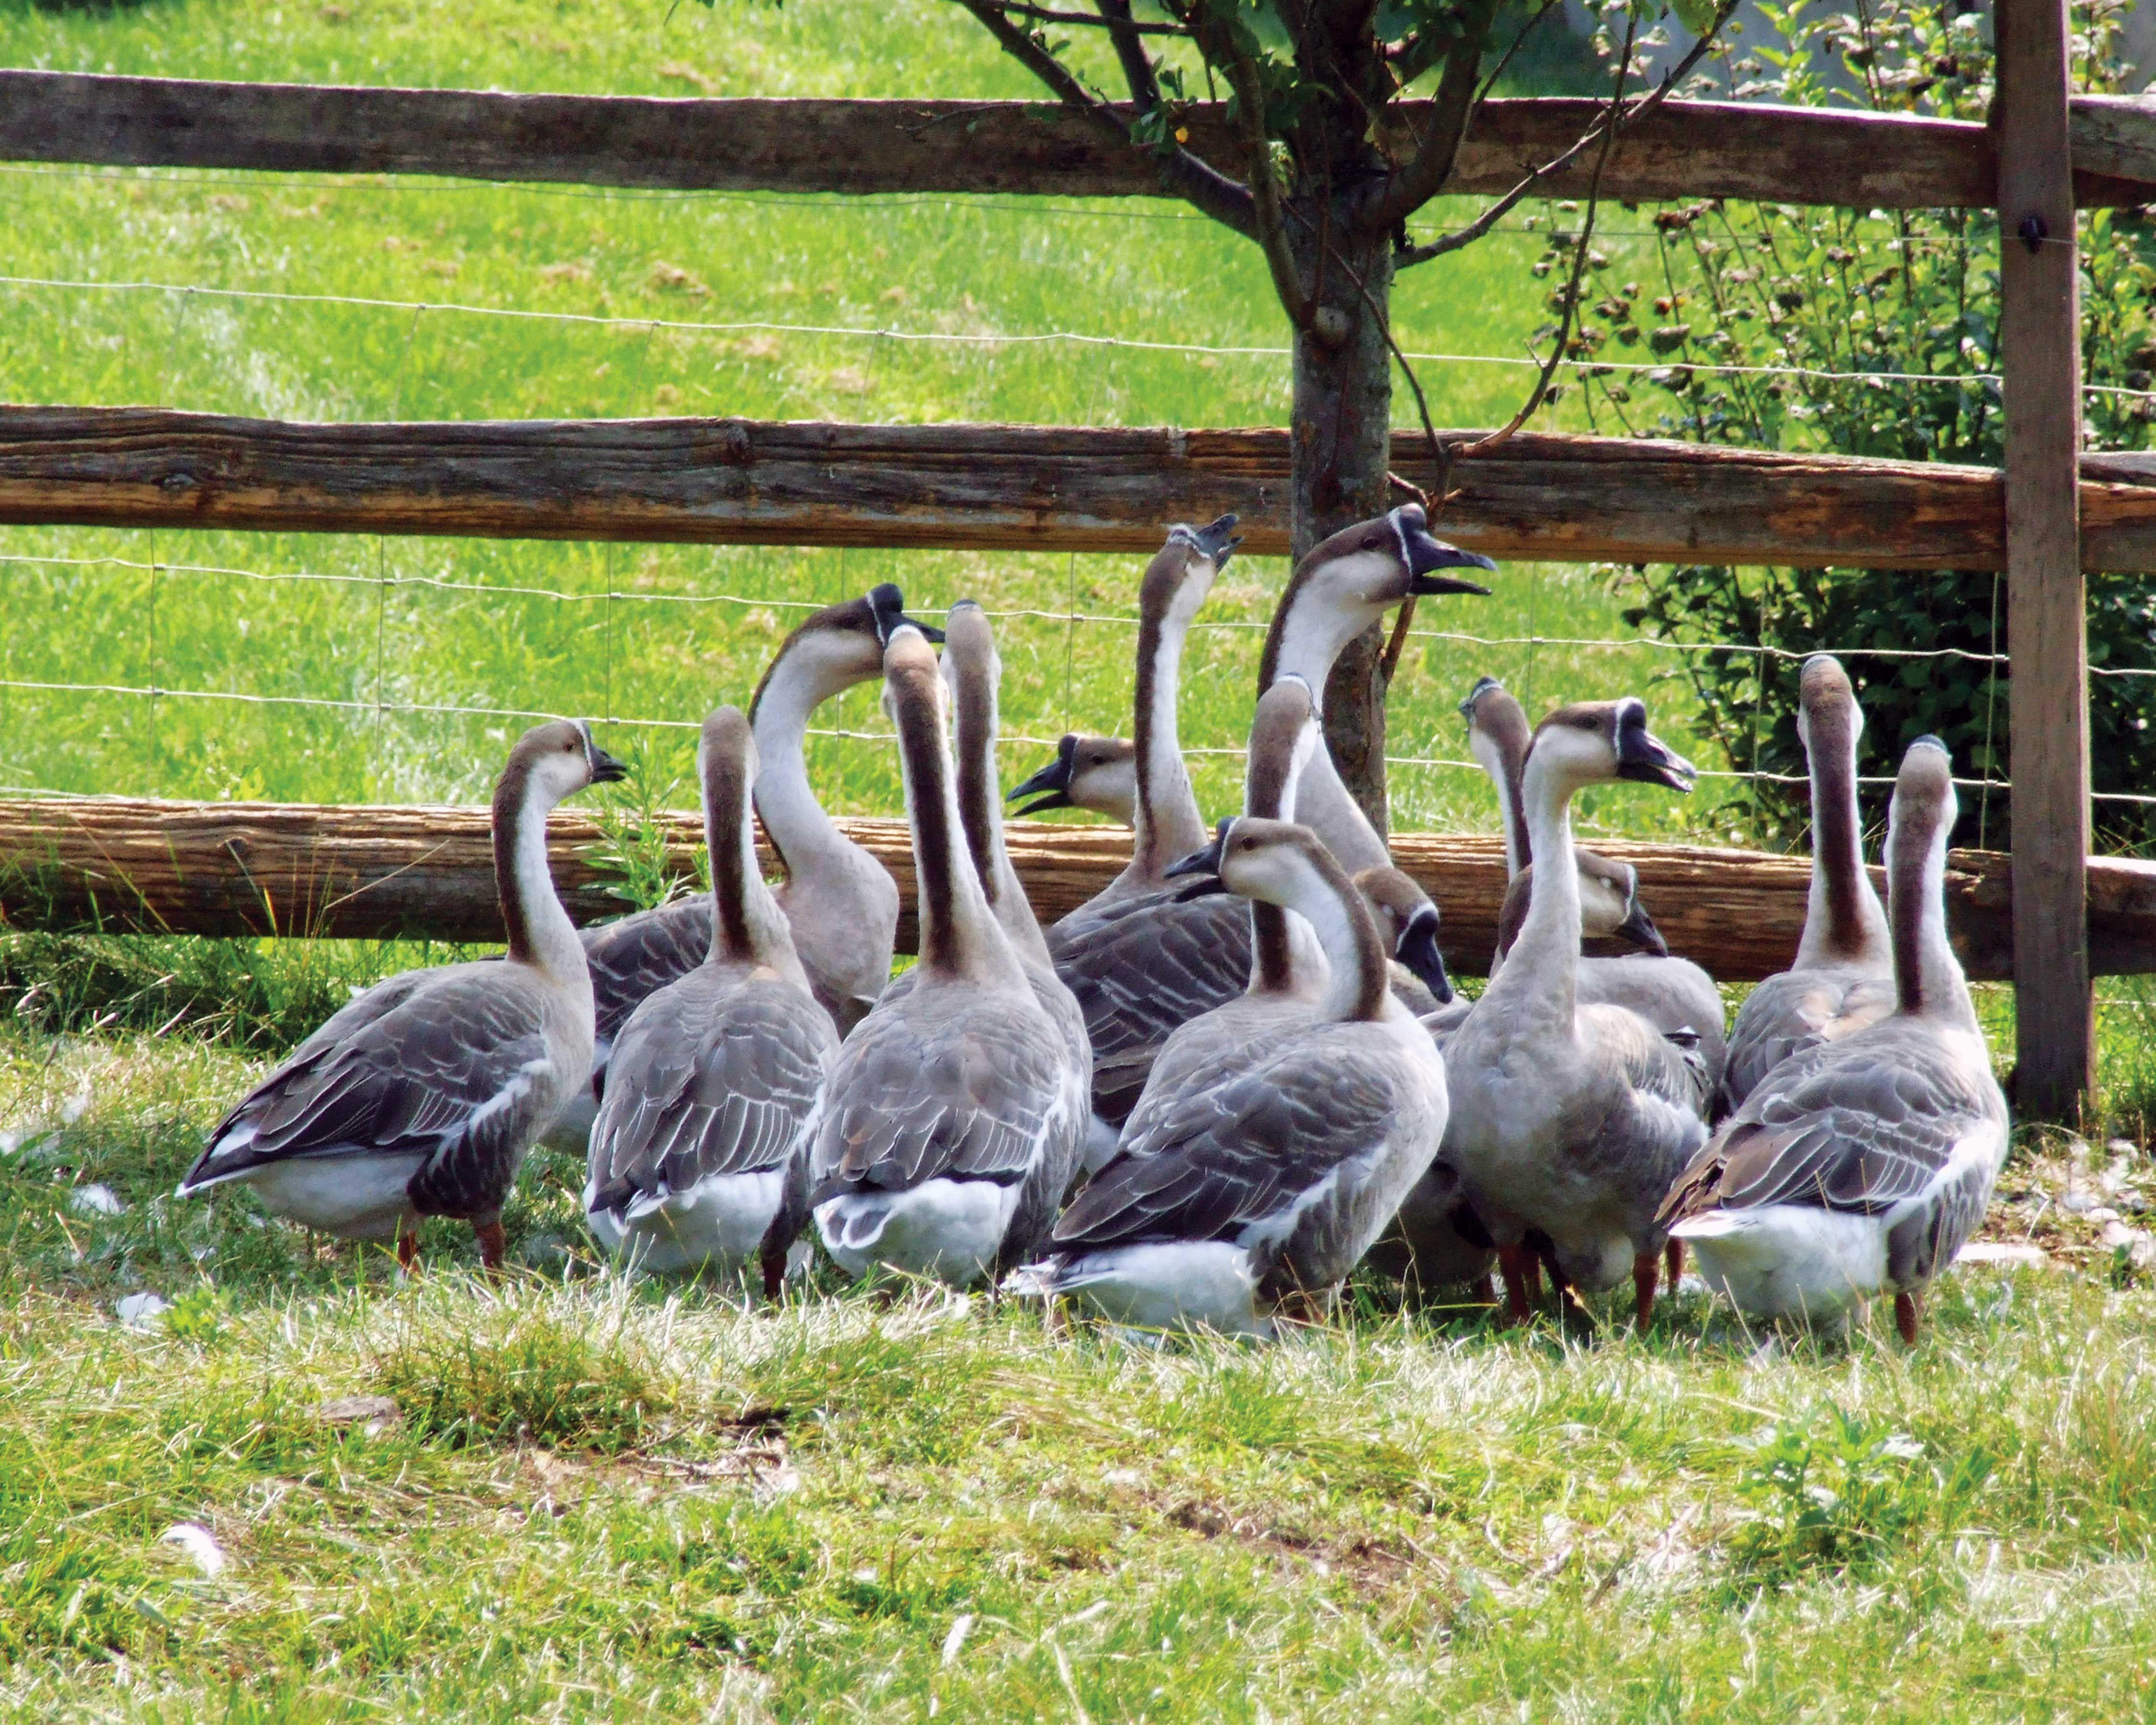 Breeding geese in the farm